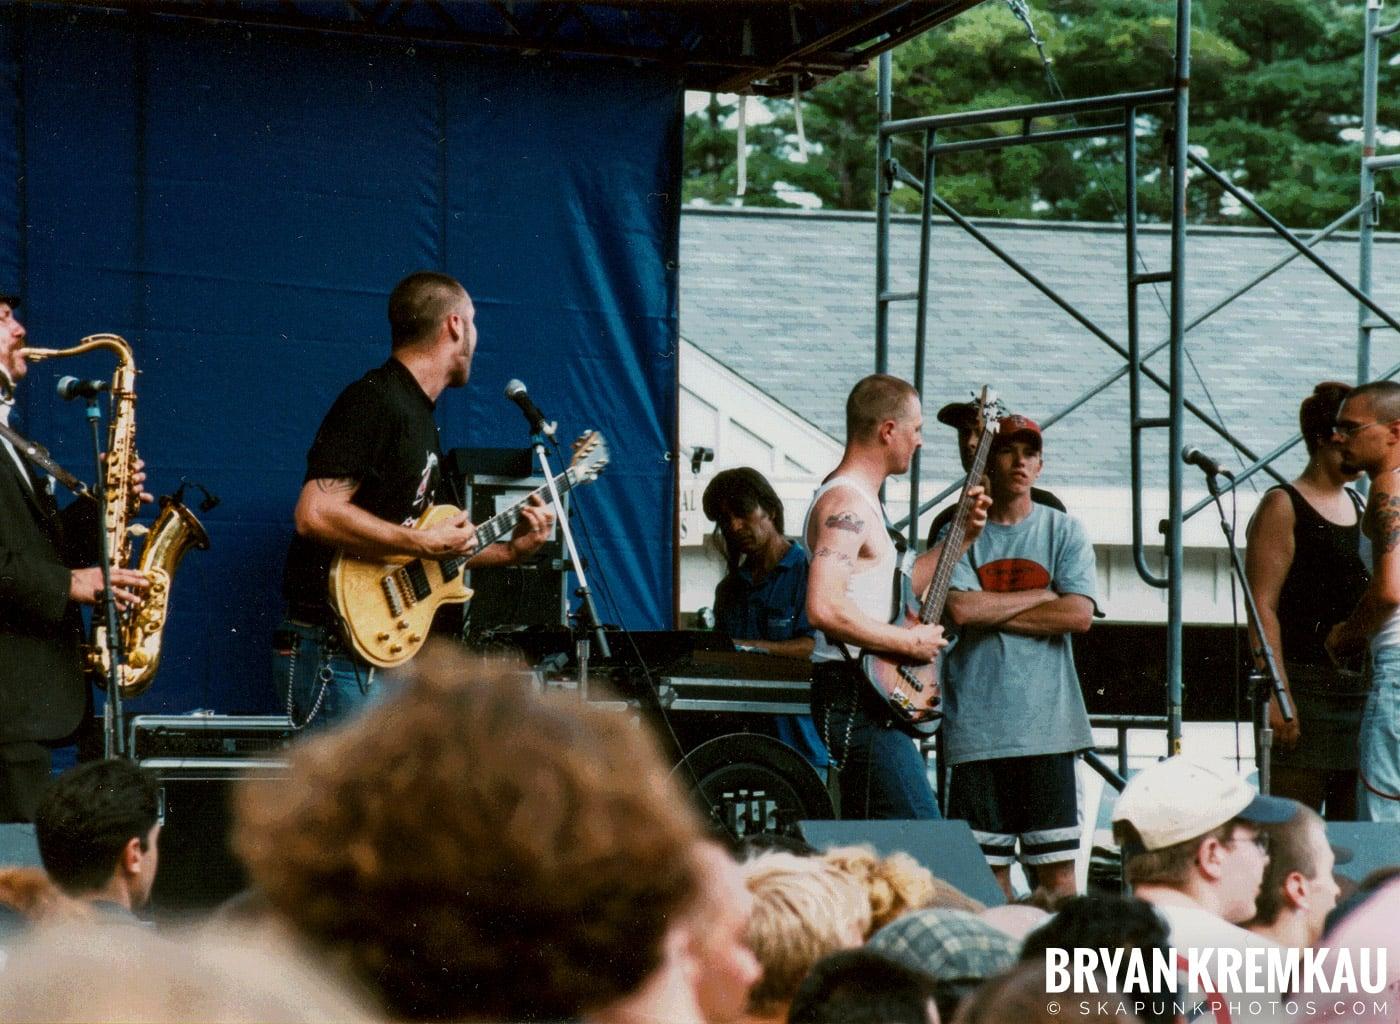 The Skoidats @ New England Ska Fest 98, Westford, MA - 8.22.98 (10)